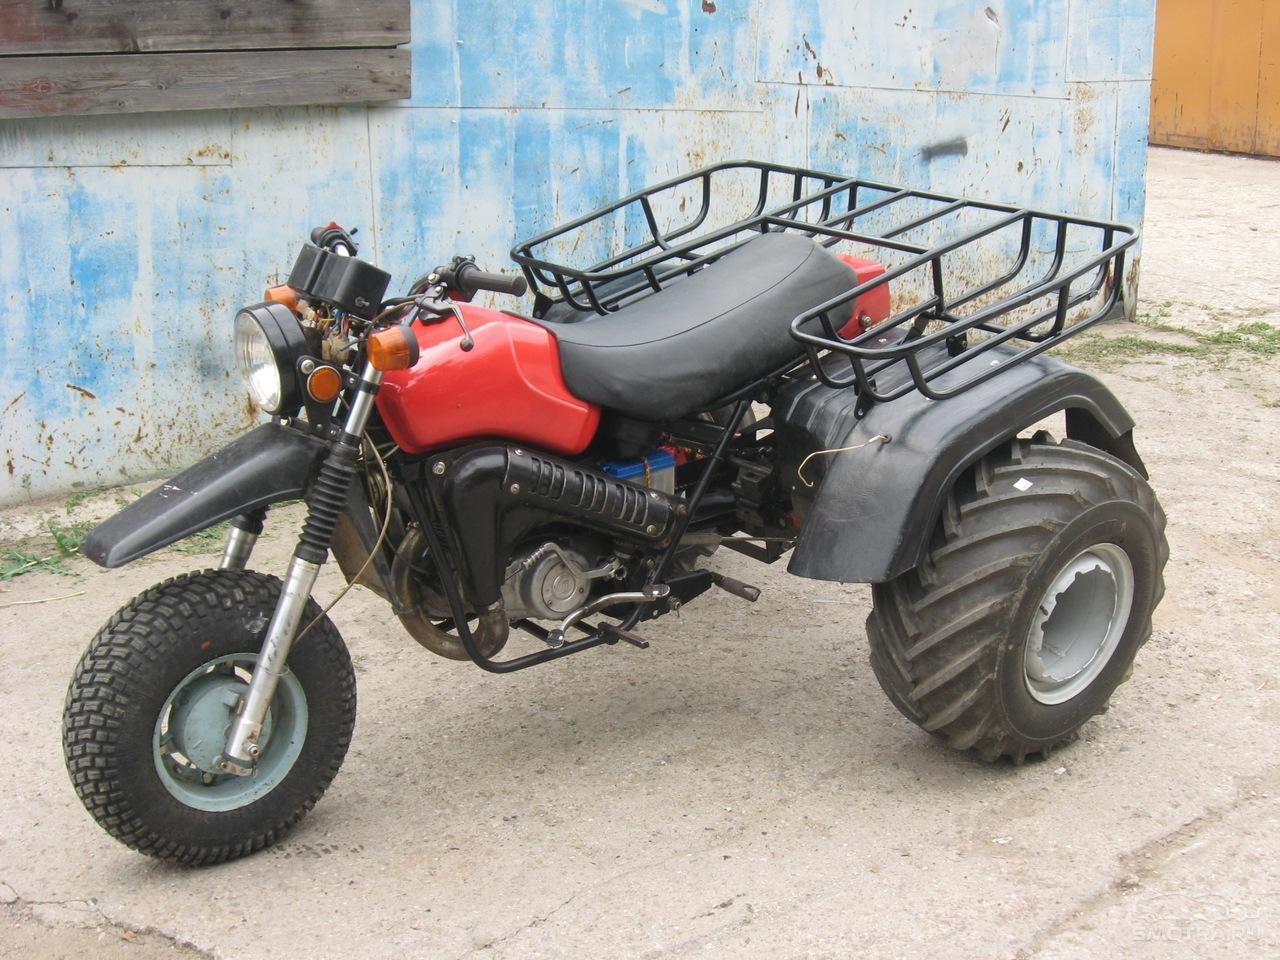 Фото русского трехколесного мотоцикла 3